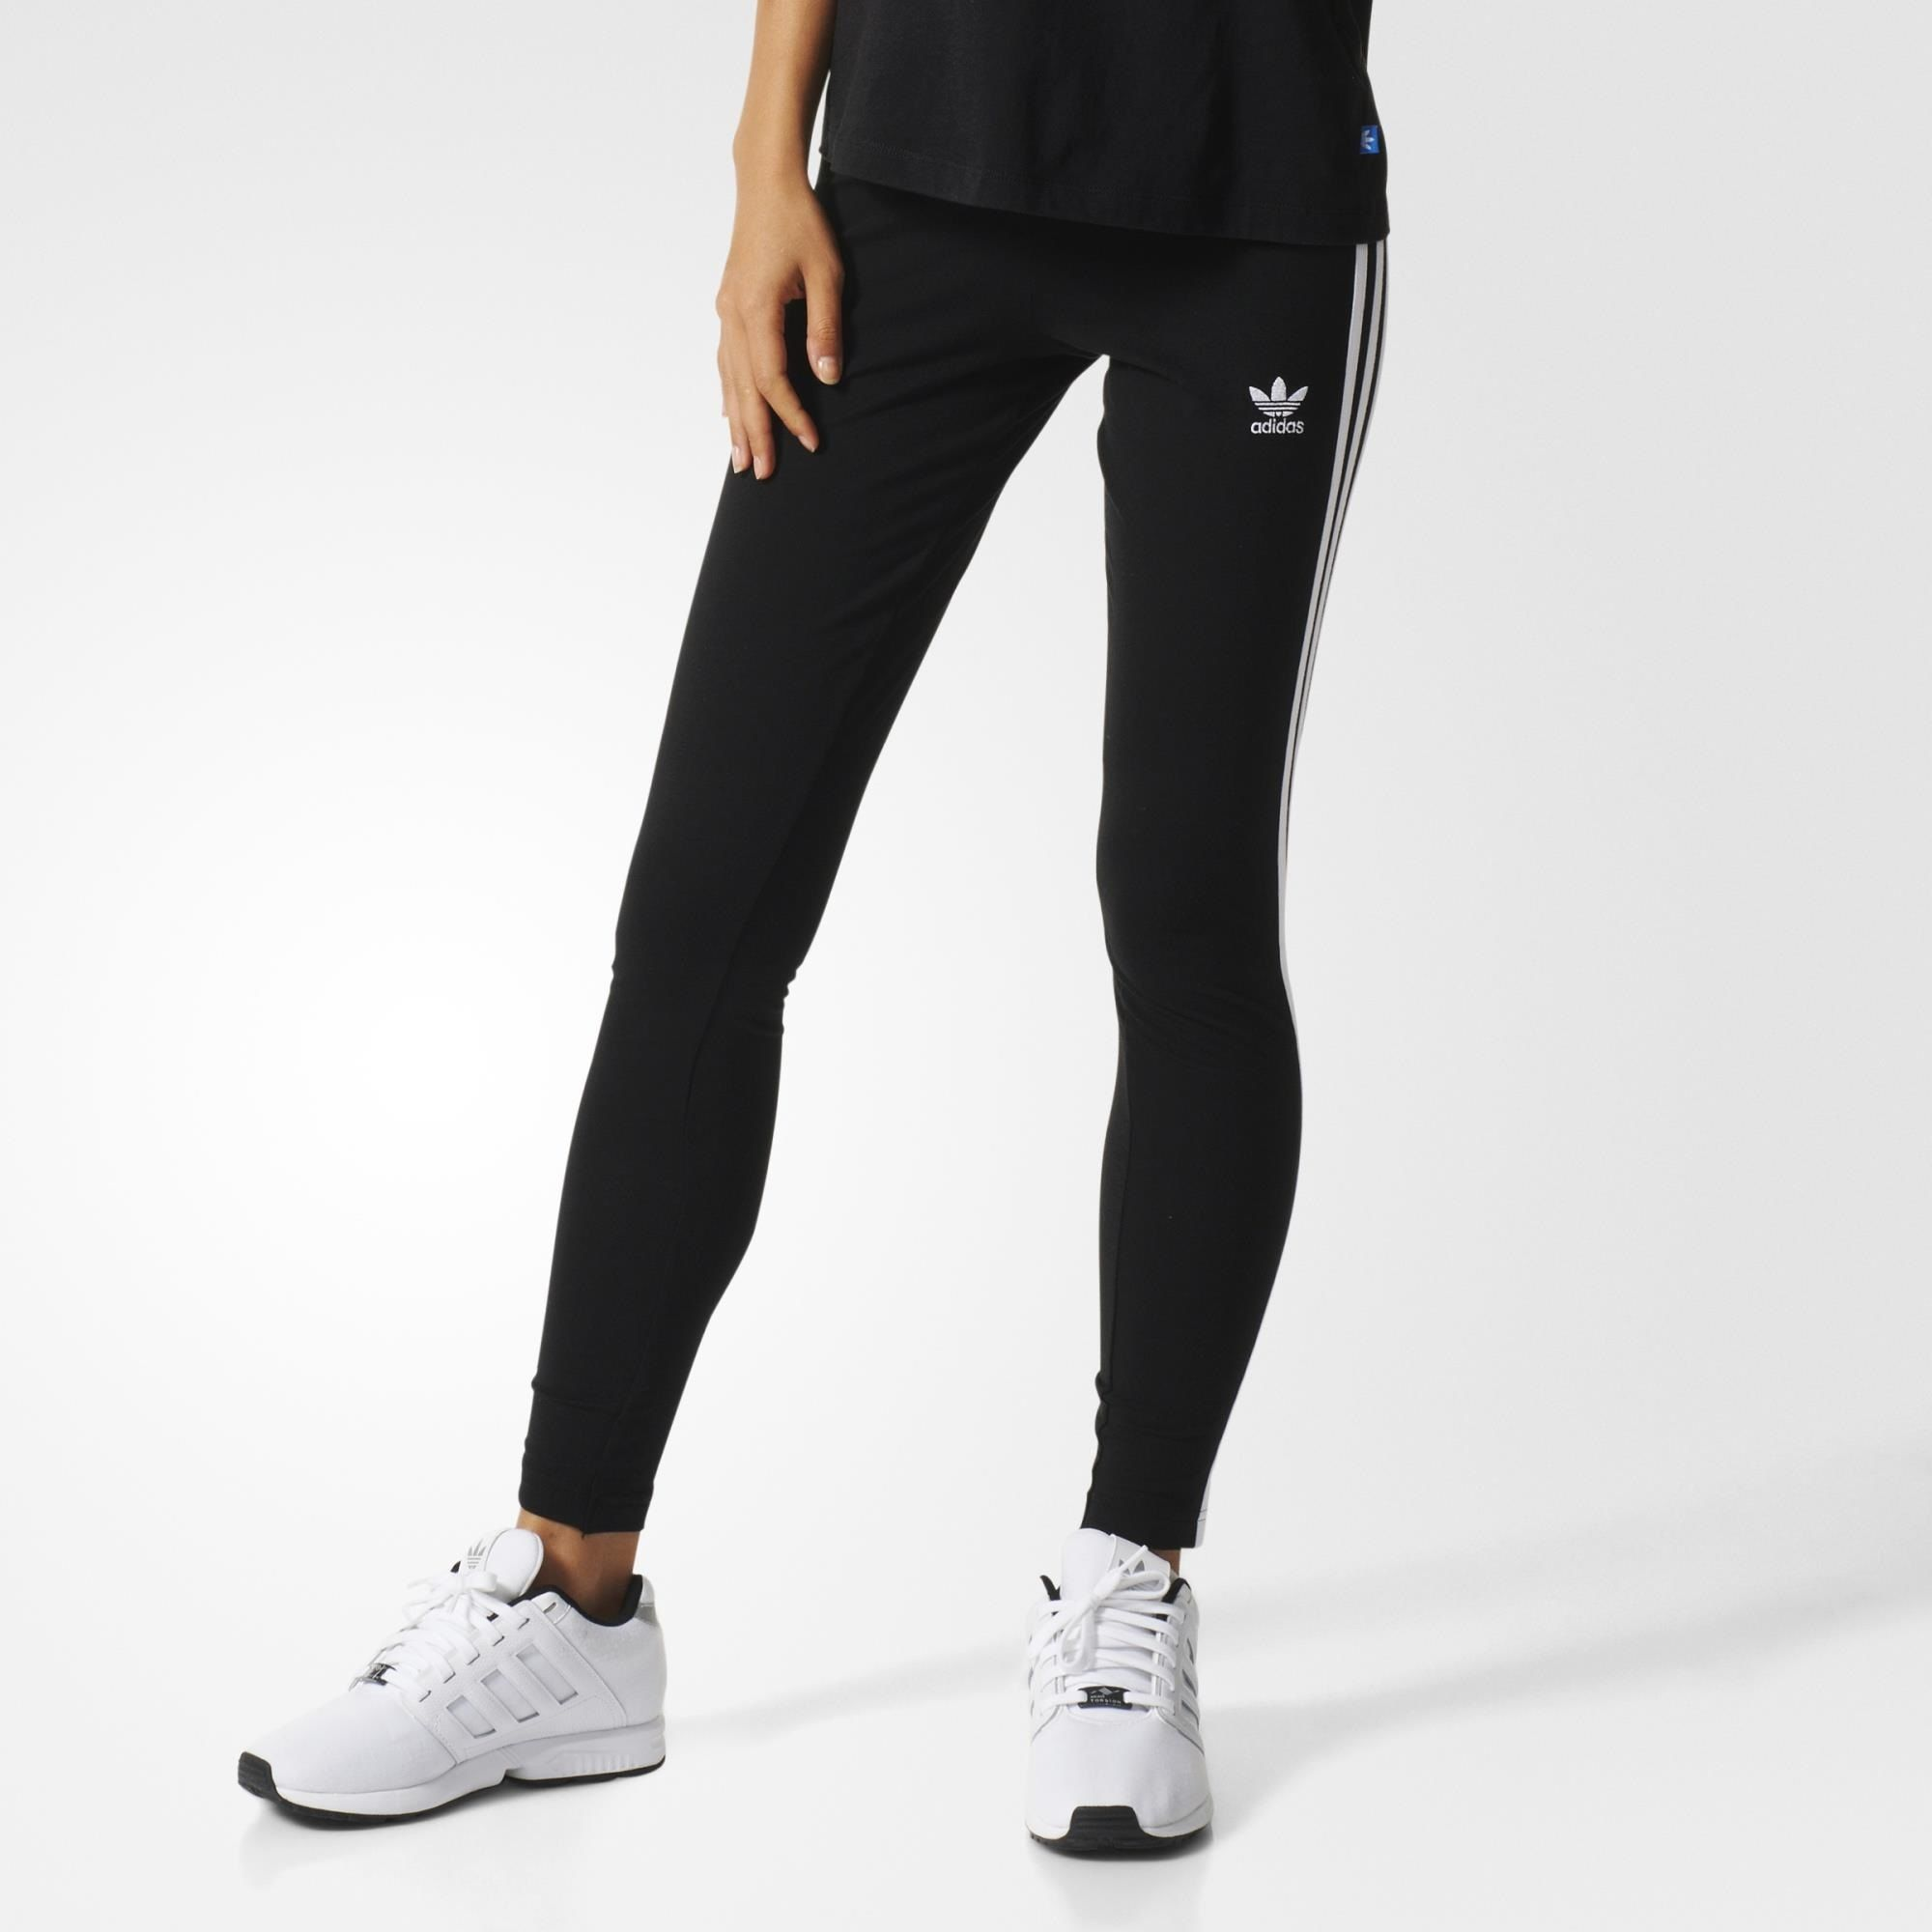 cf640a45ec12e Product details of Adidas Women's Originals 3-Stripes Leggings  AJ8156(CE2036) Black